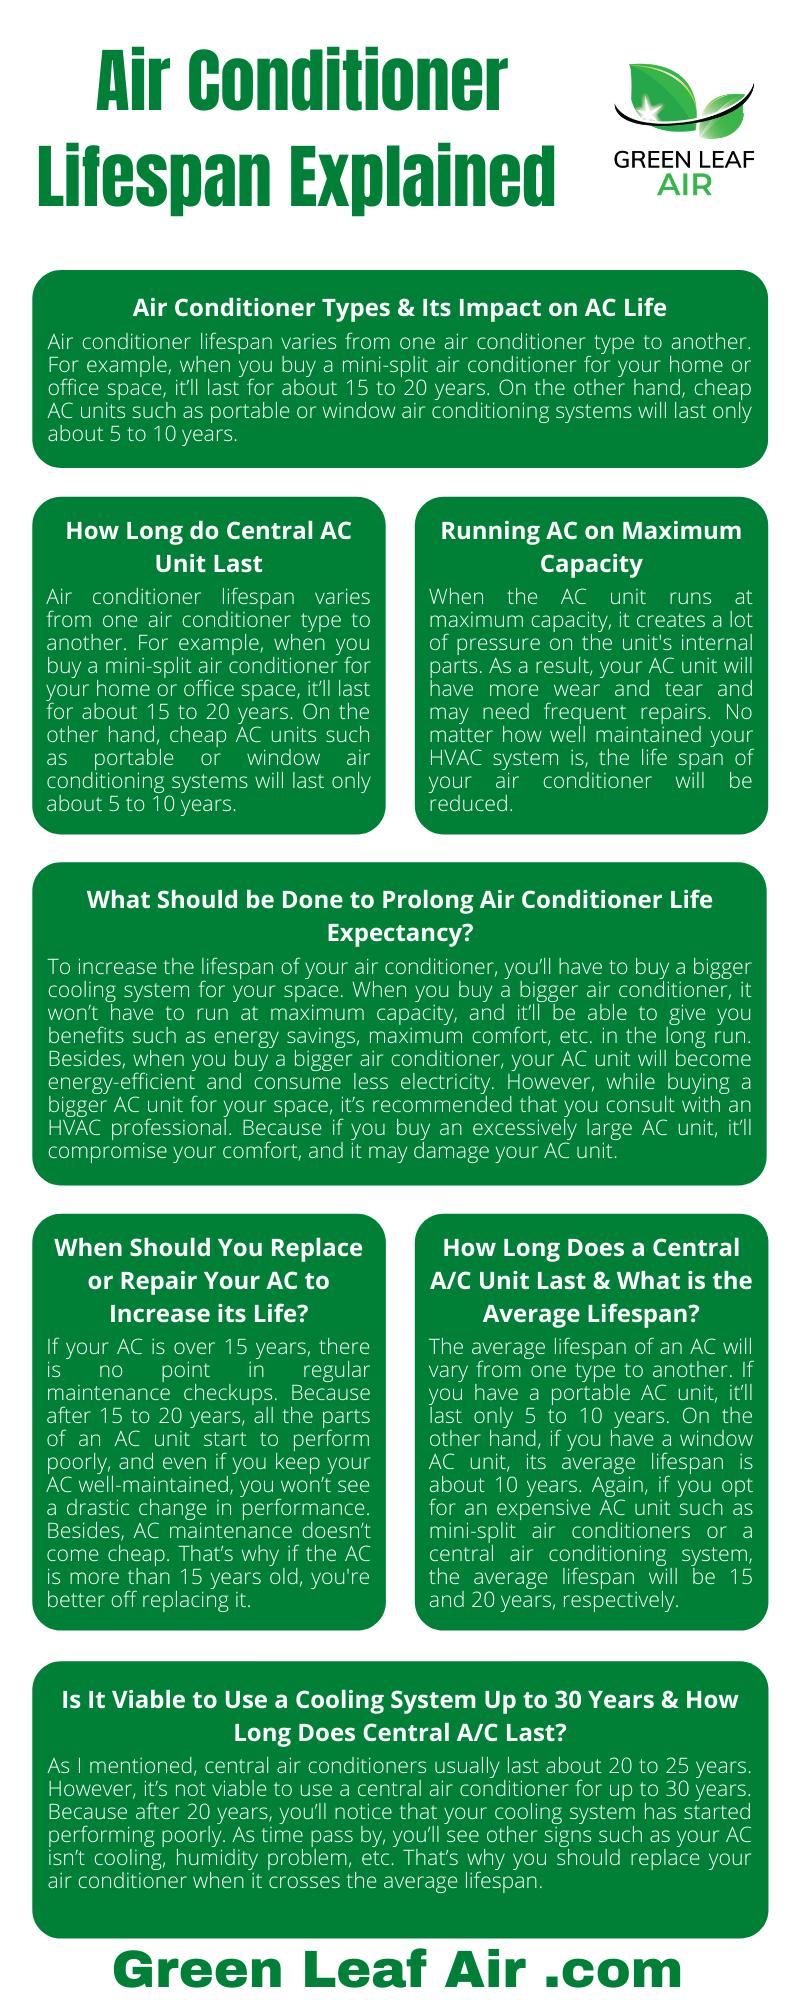 Air Conditioner Lifespan Explained